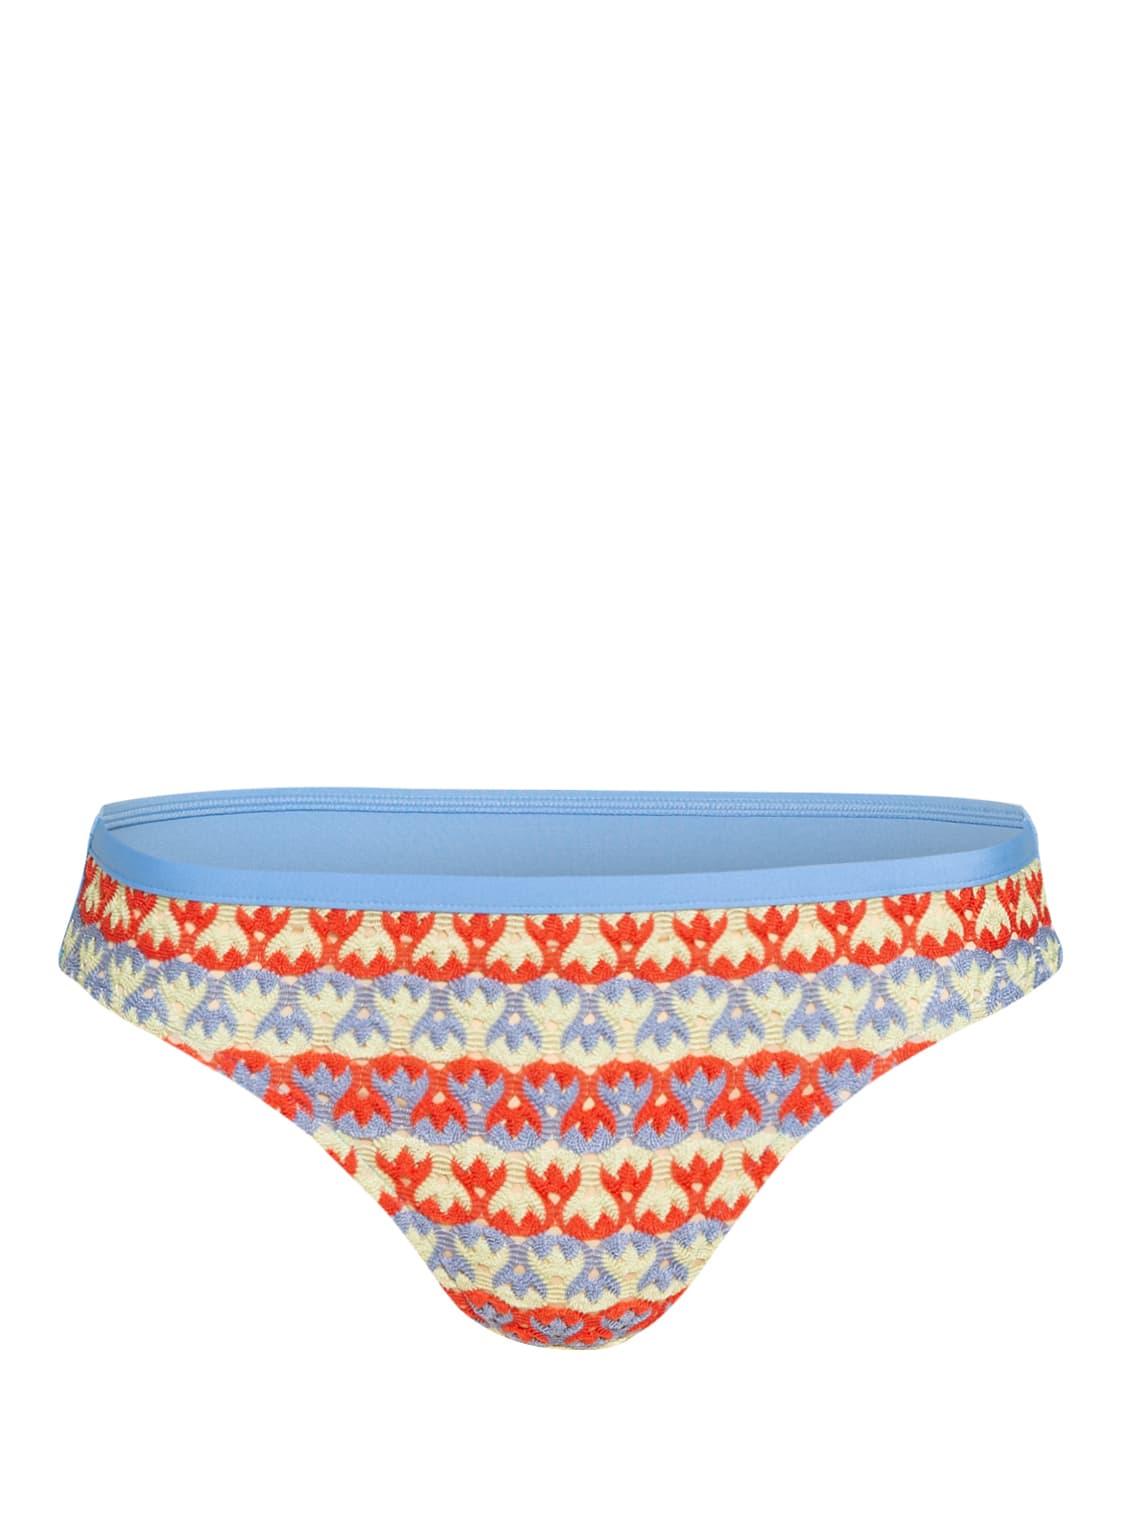 Image of Andres Sarda Bikini-Hose Imagine blau